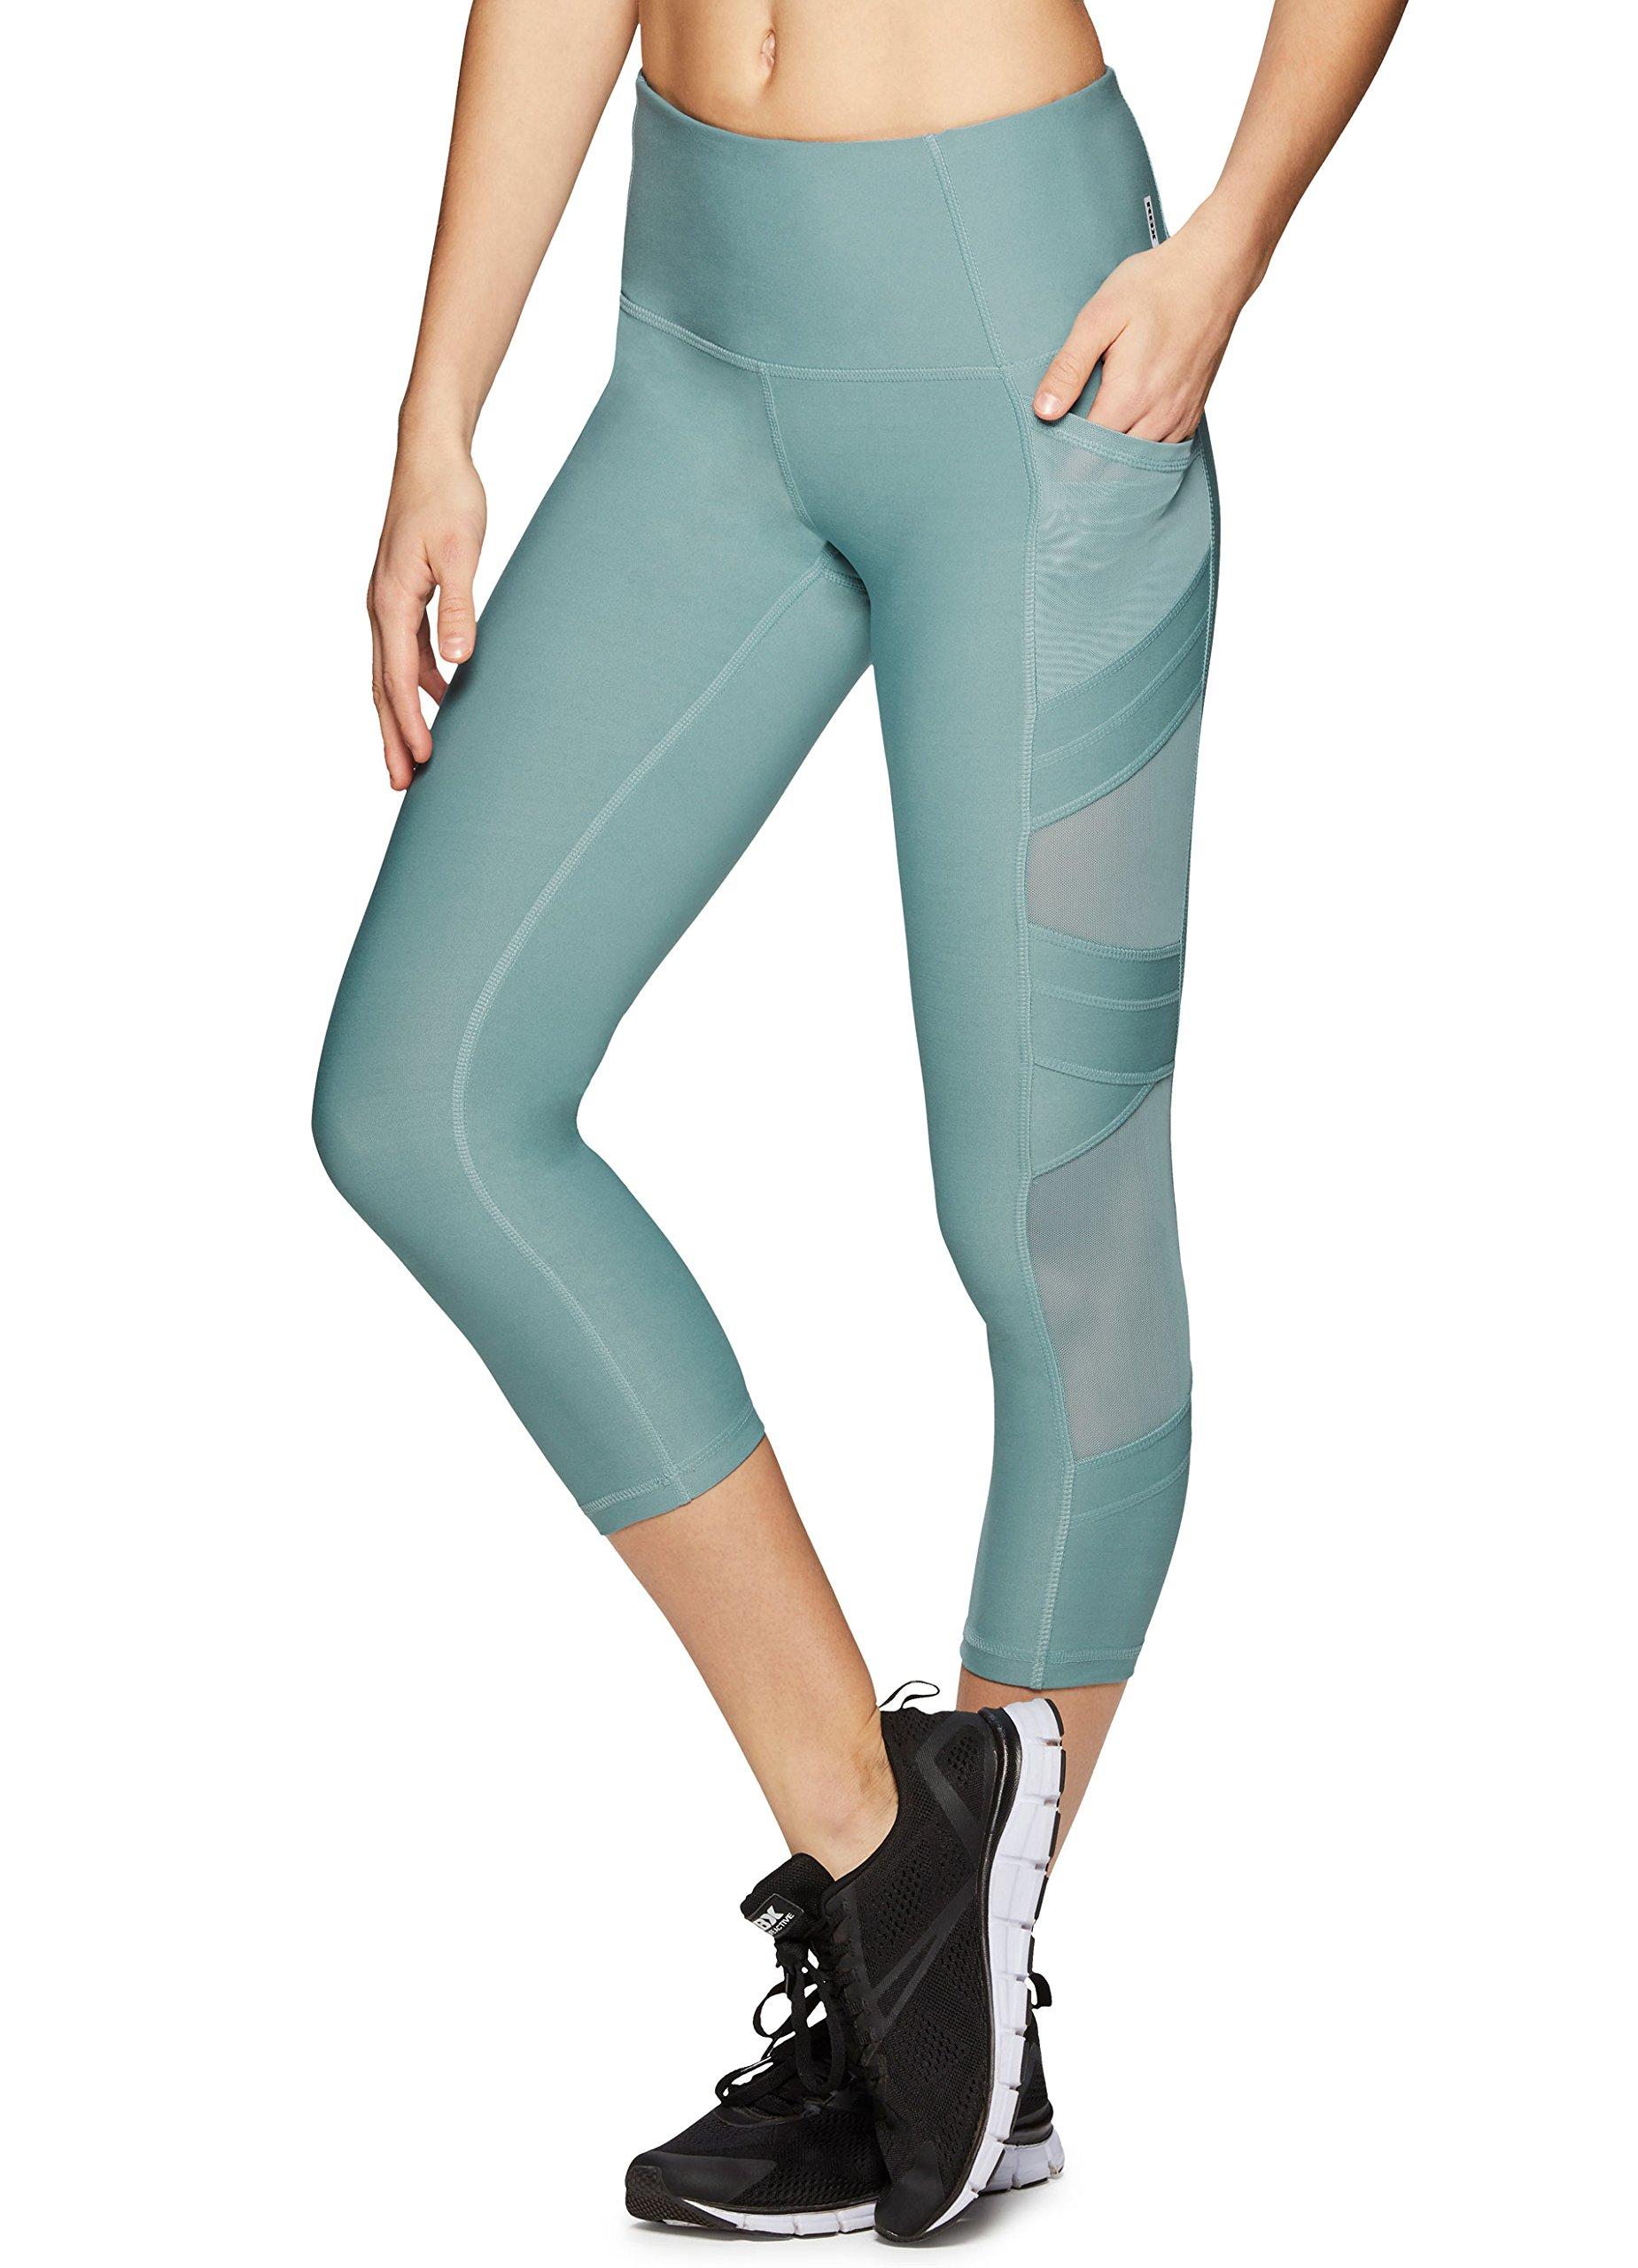 567aecc3c7b9d Galleon - RBX Active Women's Mesh Pilates Fashion Workout Yoga Leggings  Green XL